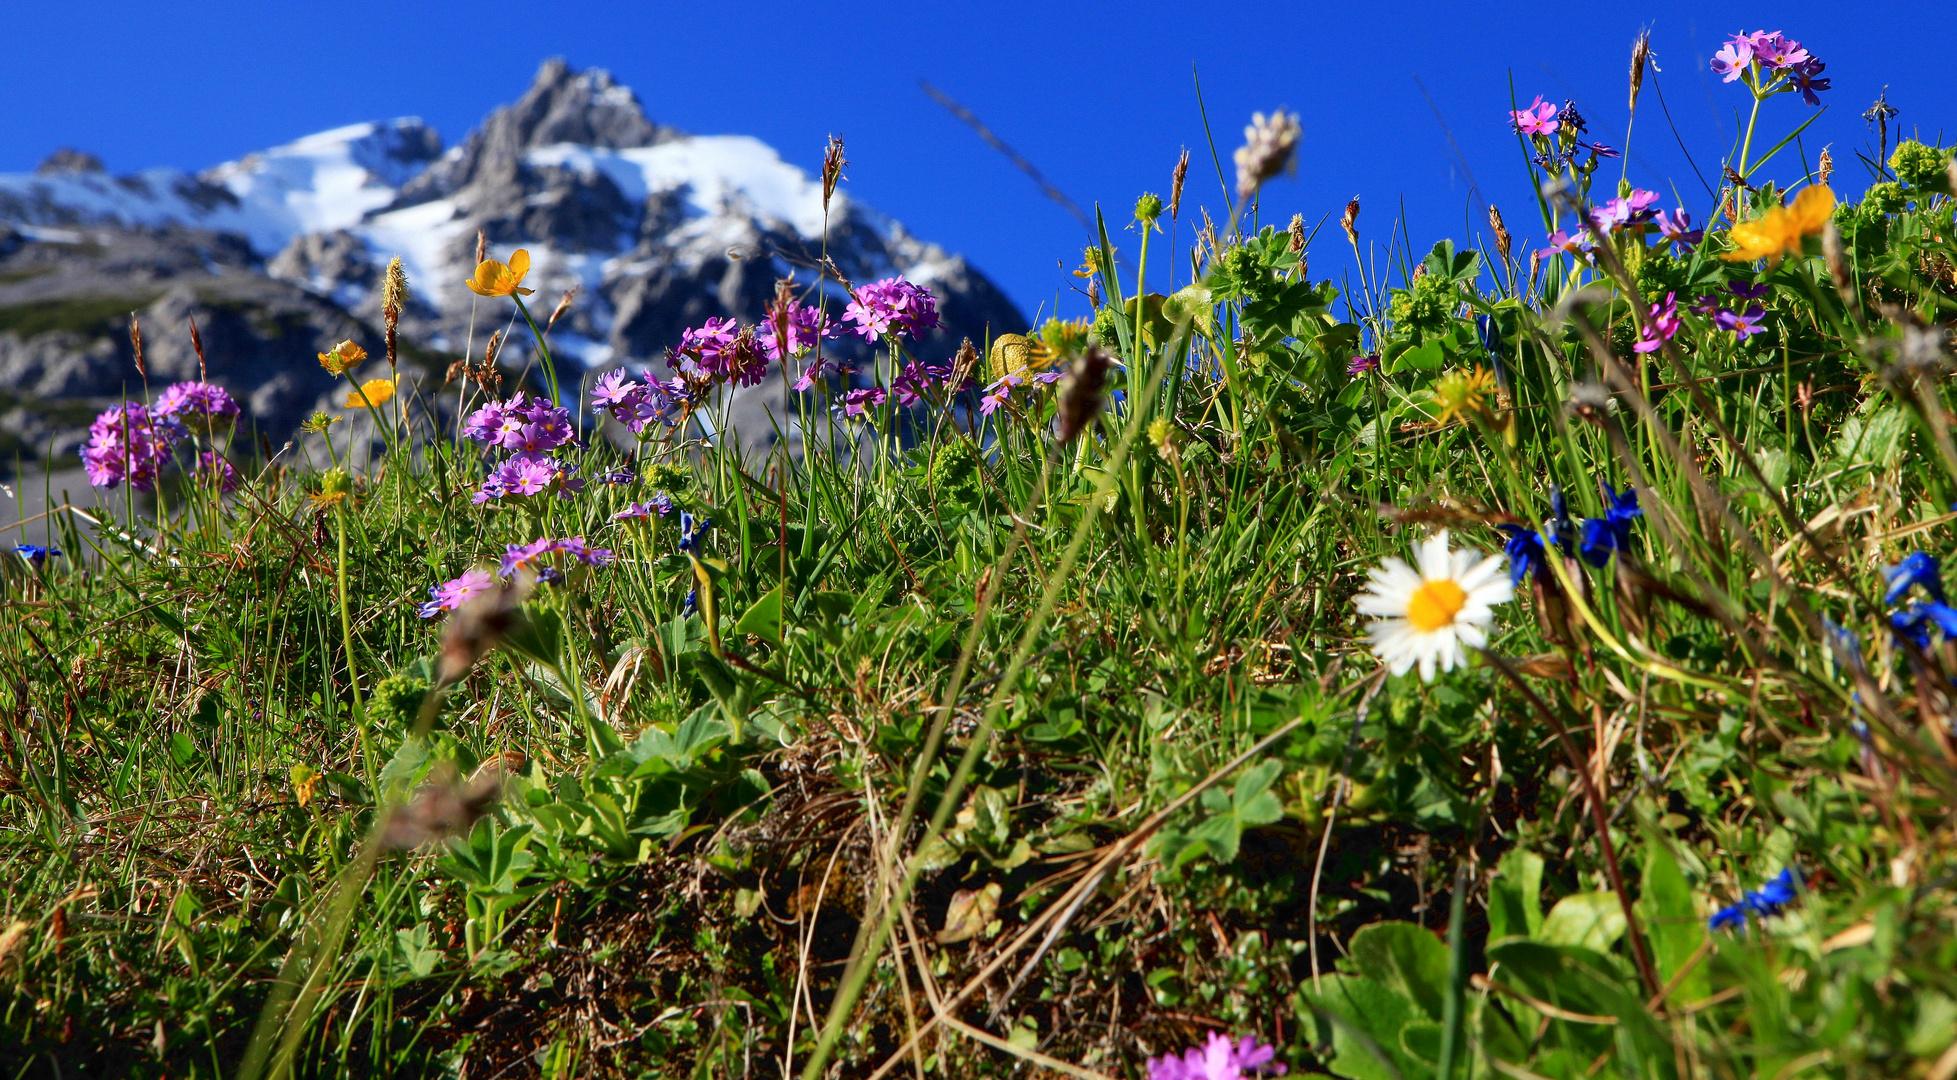 alpenblumen foto bild pflanzen pilze flechten natur natur bilder auf fotocommunity. Black Bedroom Furniture Sets. Home Design Ideas